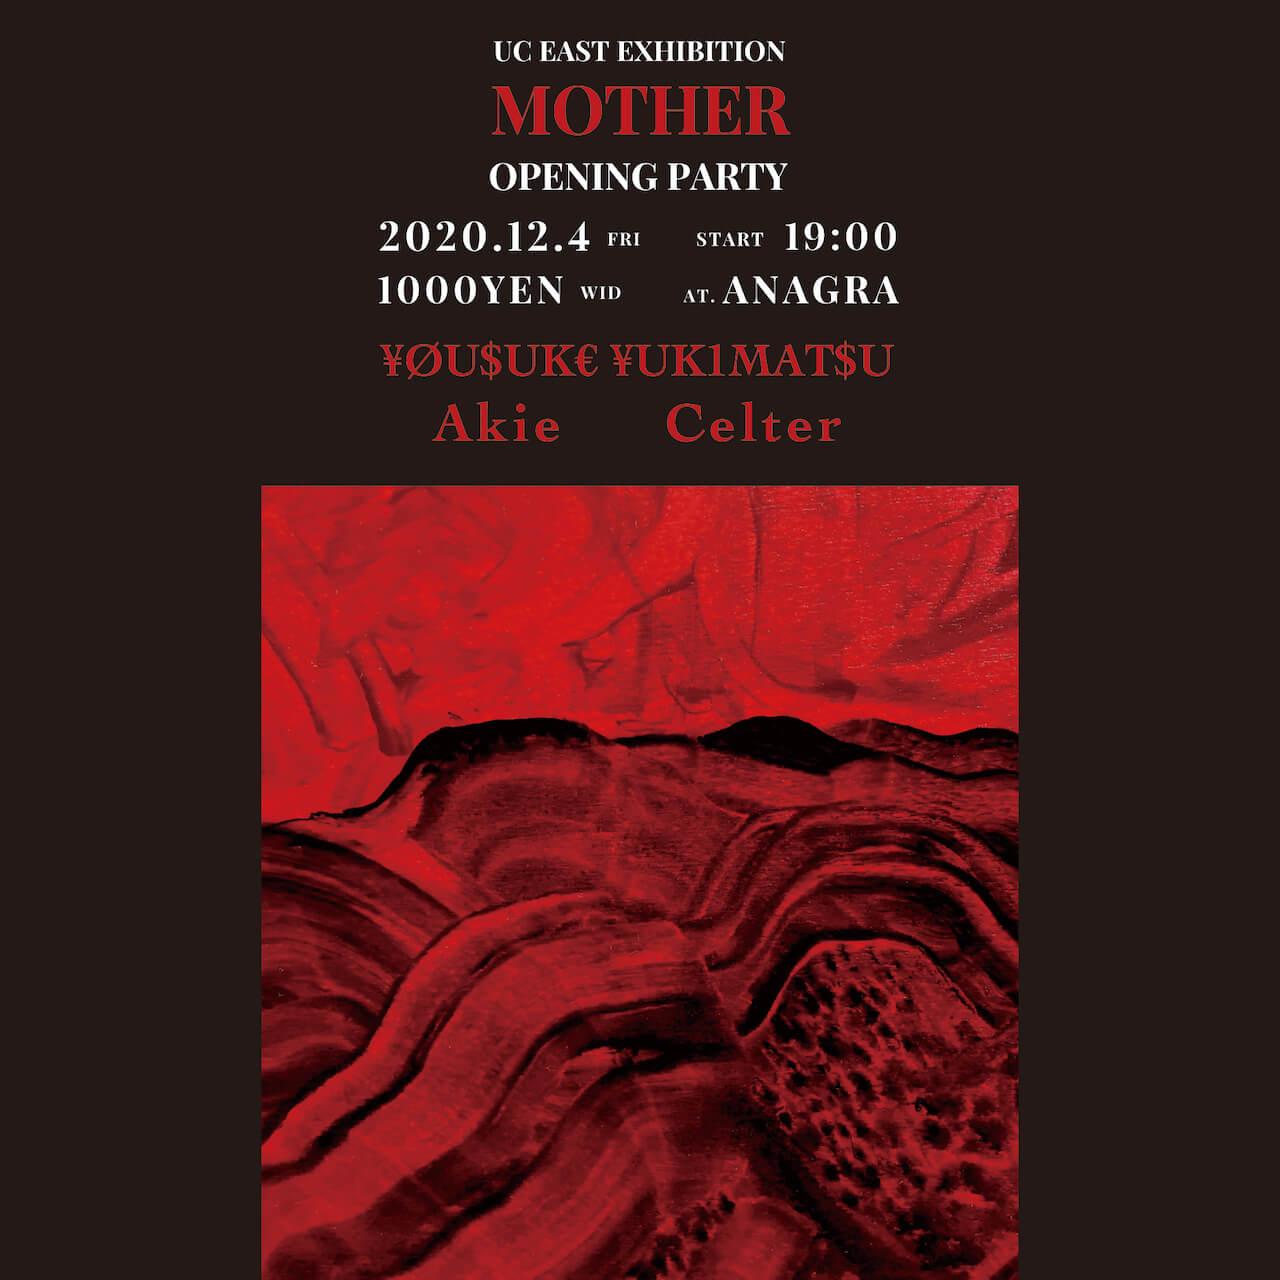 UC EASTの東京初個展「MOTHER」がANAGRAにて開催 オープニングパーティには¥ØU$UK€ ¥UK1MAT$U、Akie、Celterが出演 art-culture201202-uceast-anagra-1